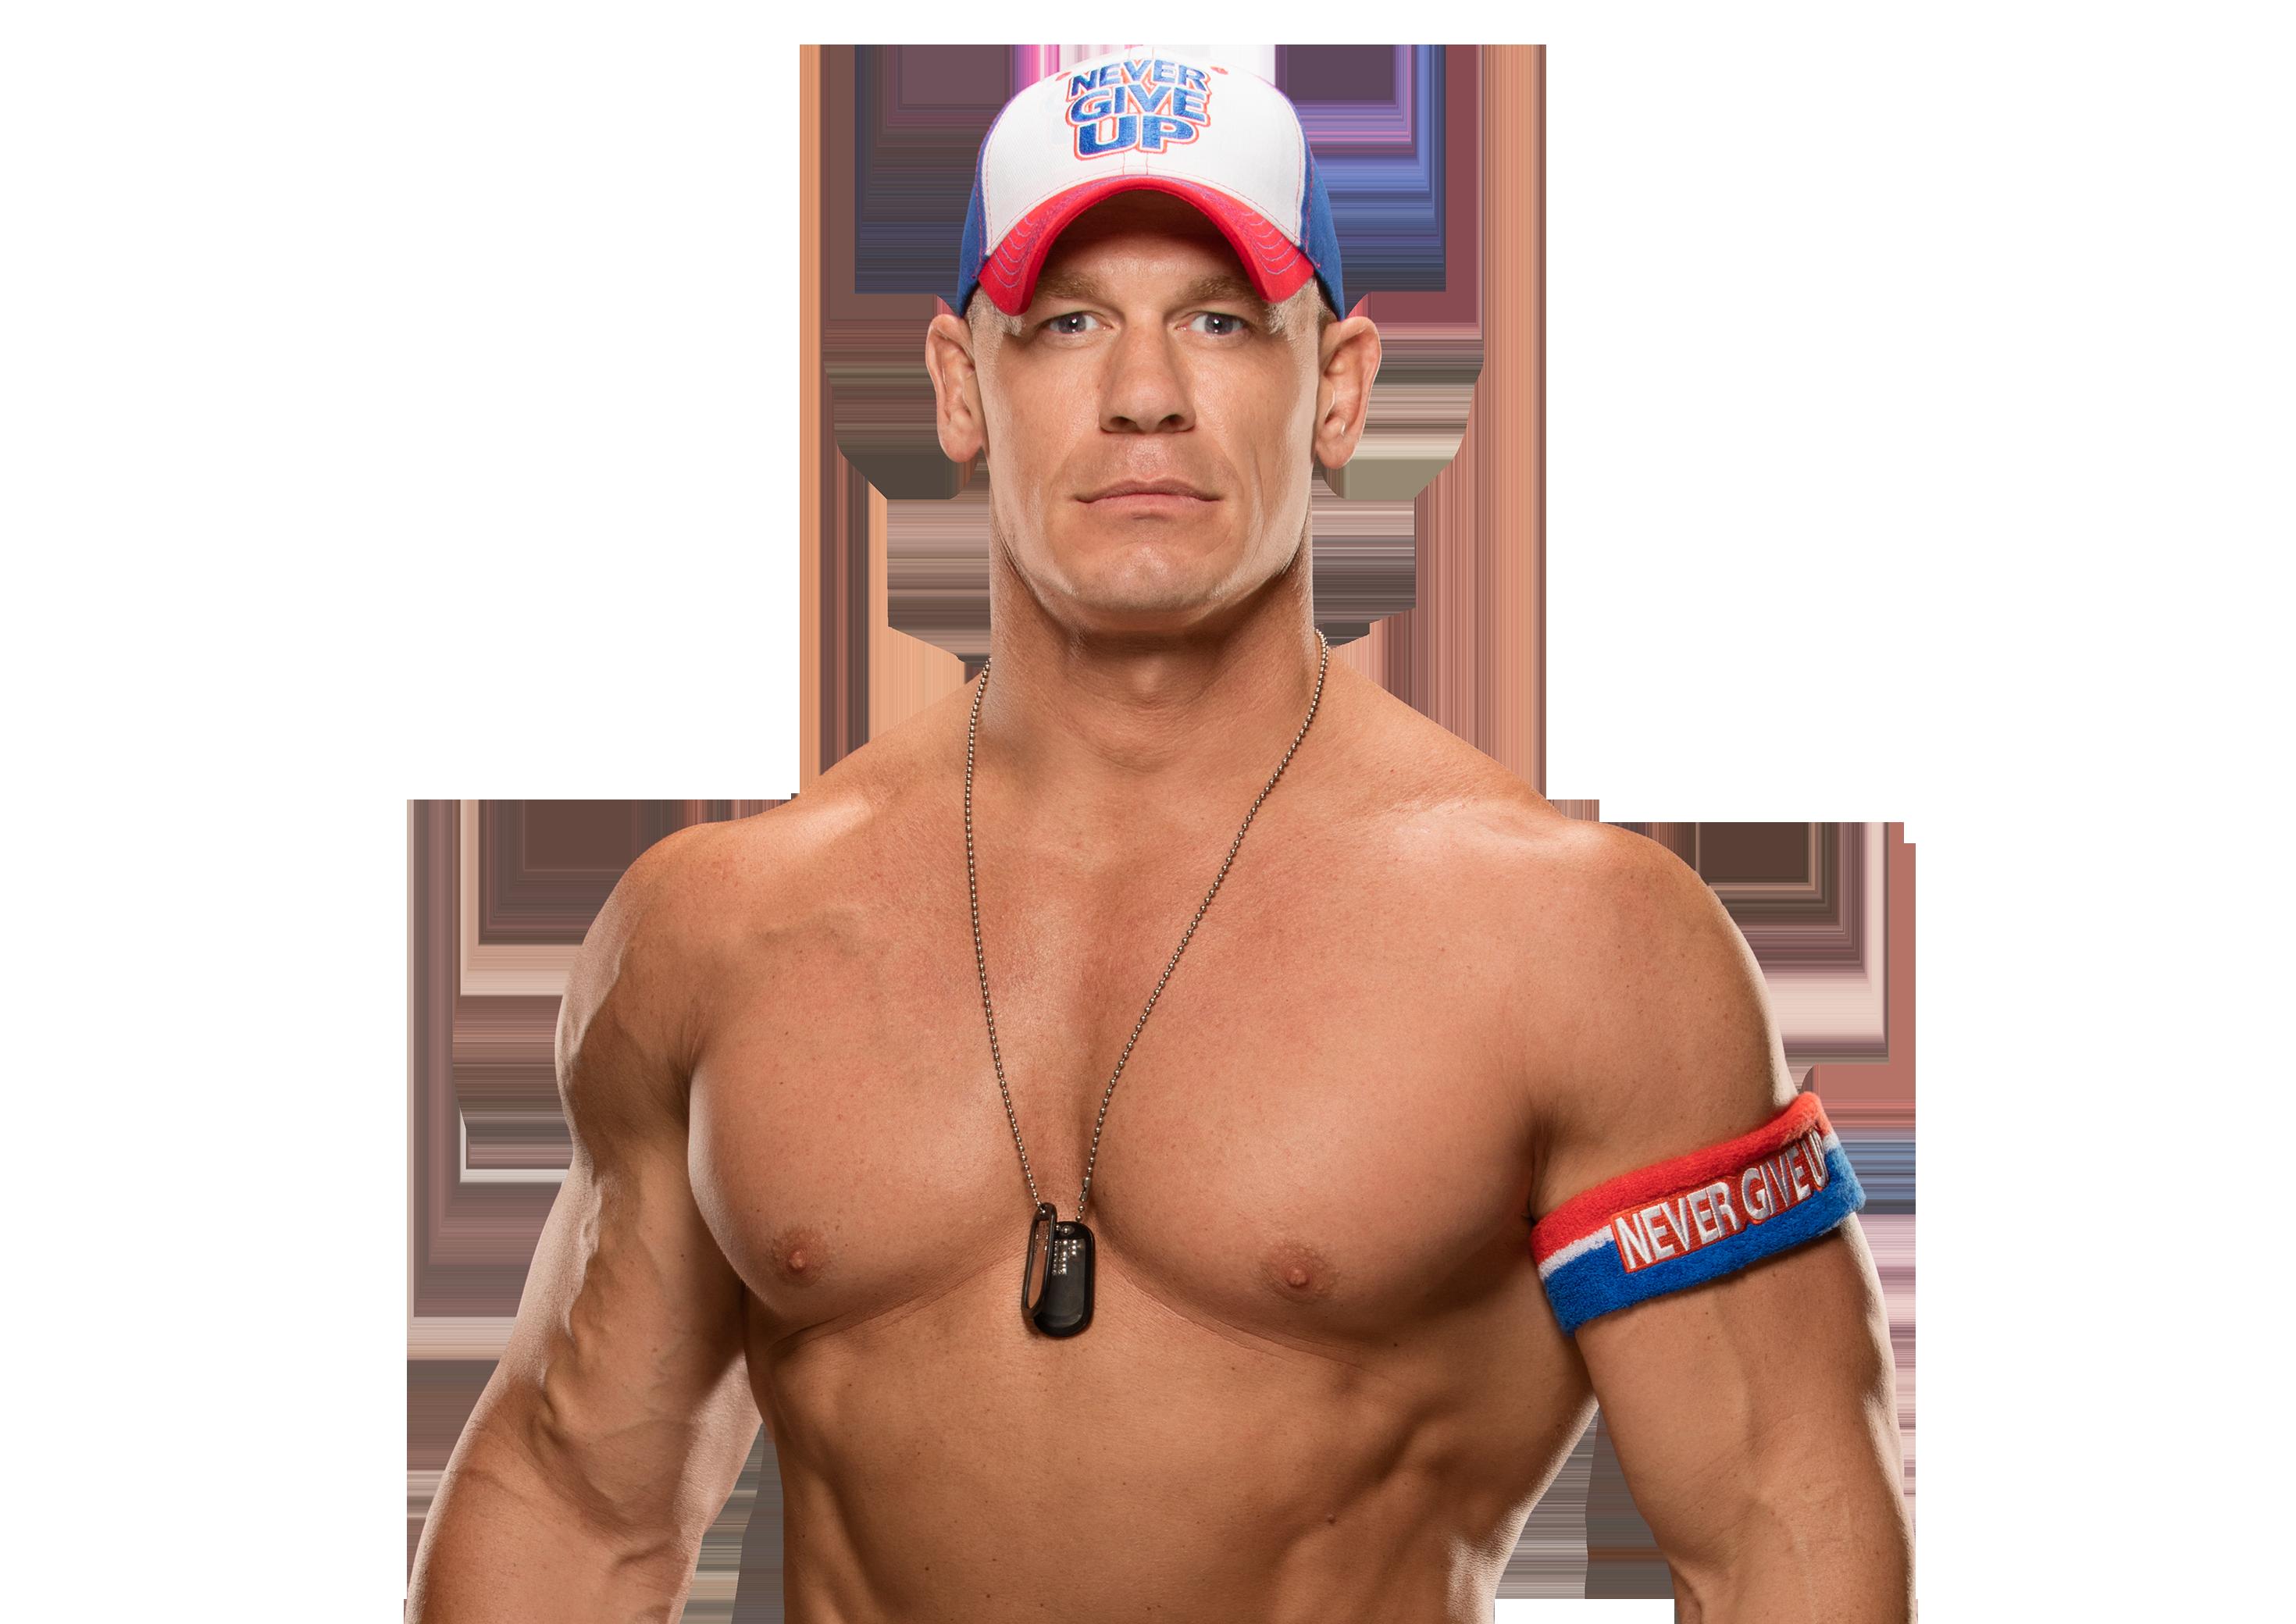 Home John Cena Wrestler Jone Cena